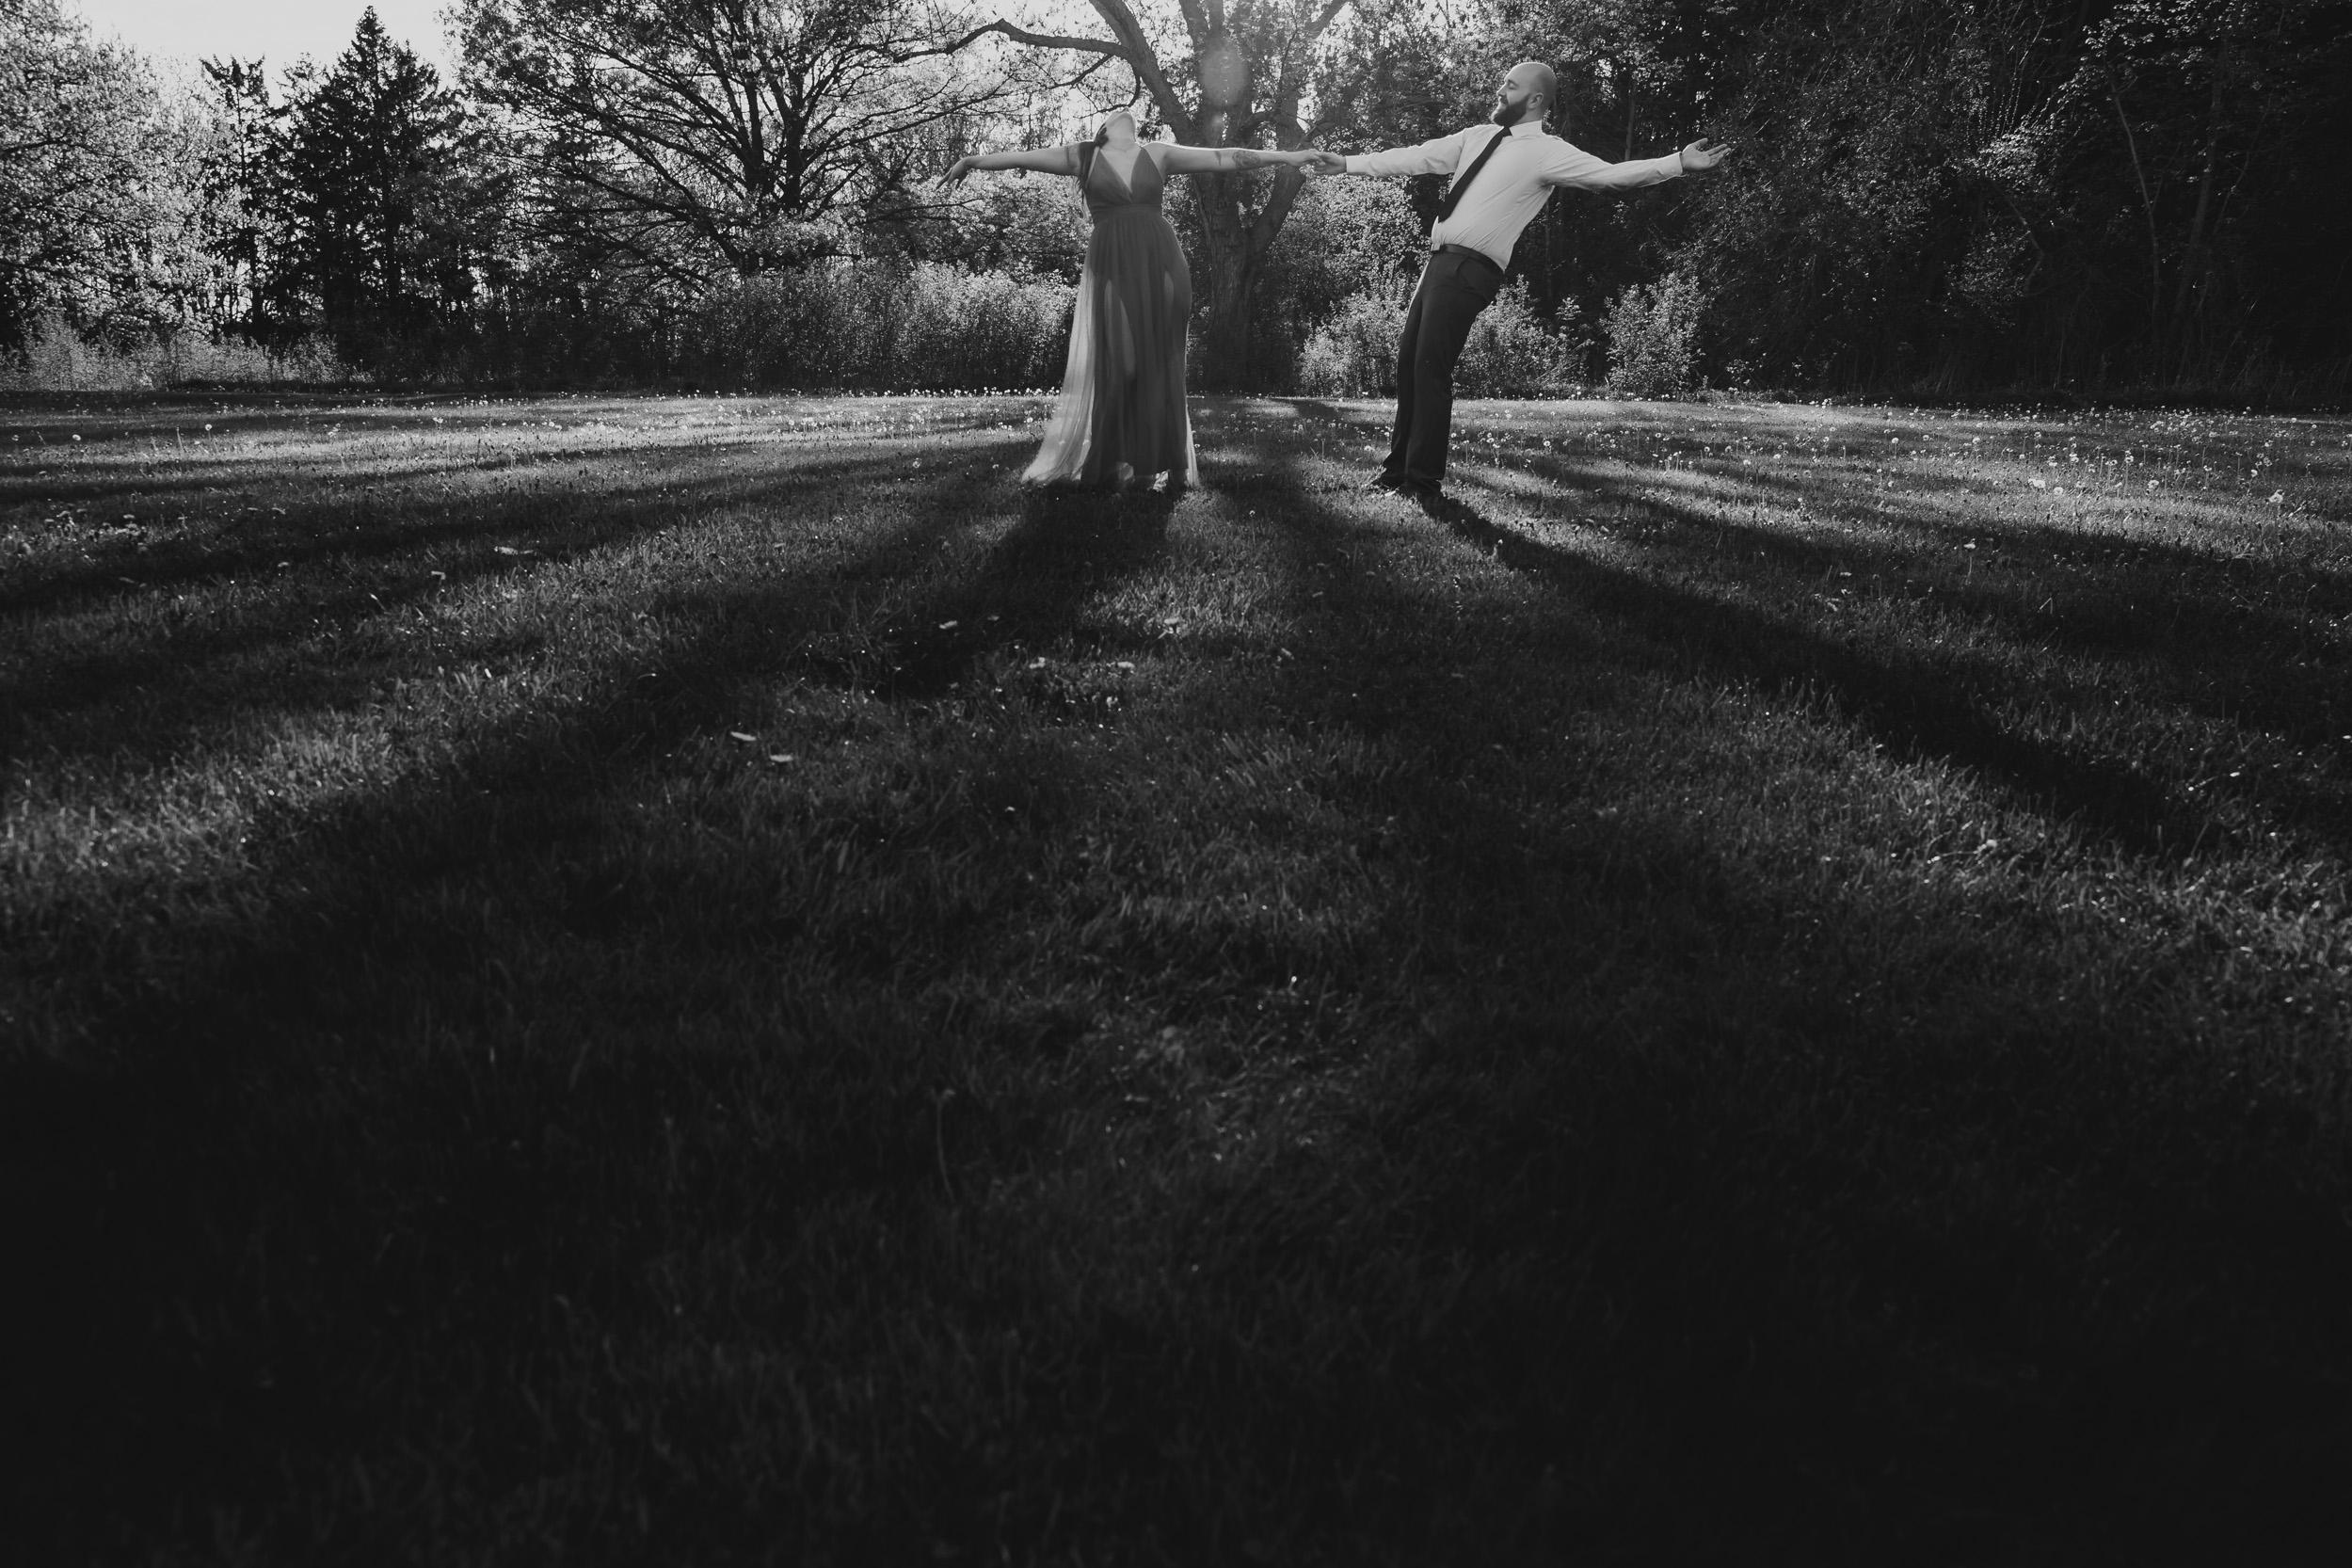 20190526_Kyleigh_&_Daniel_by_Ian_Xu_Studio-124.jpg